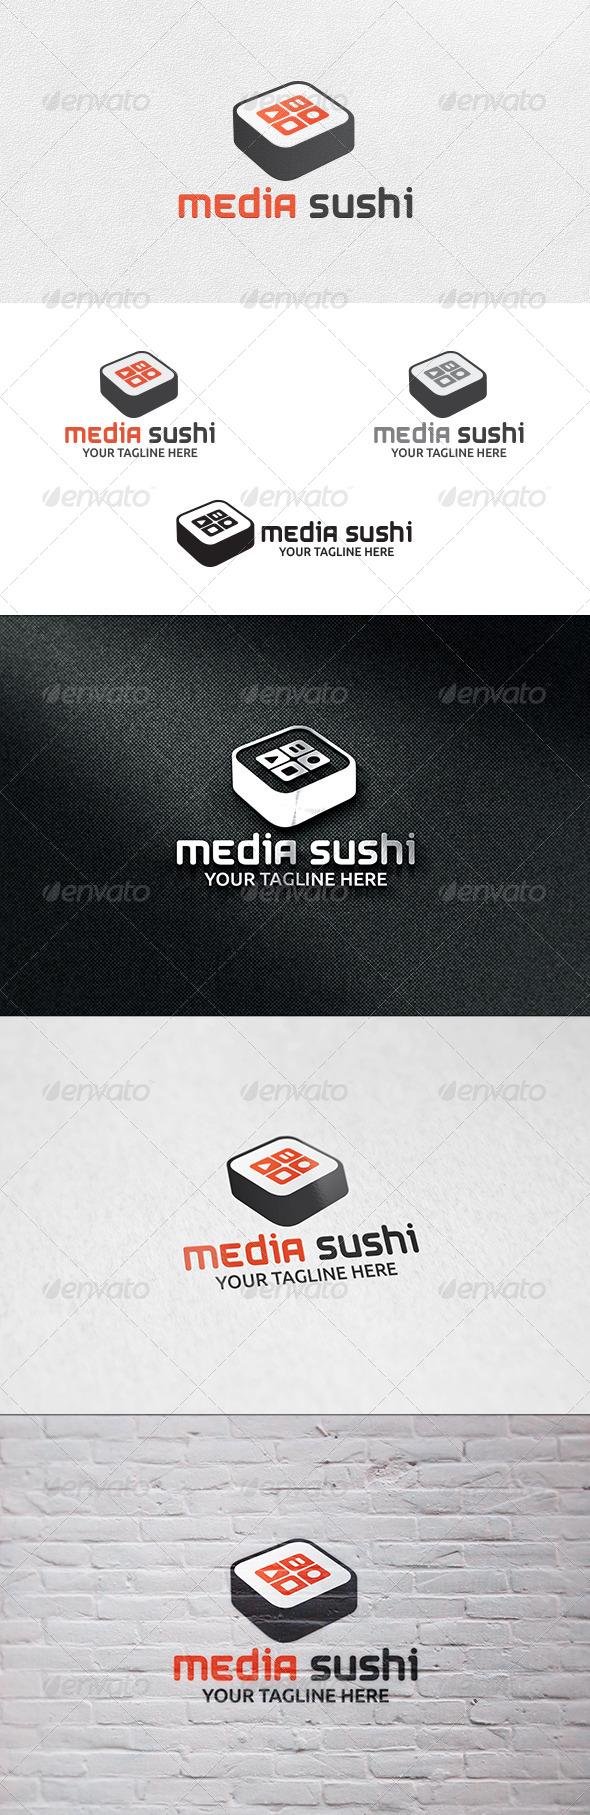 GraphicRiver Media Sushi Logo Template 7152638